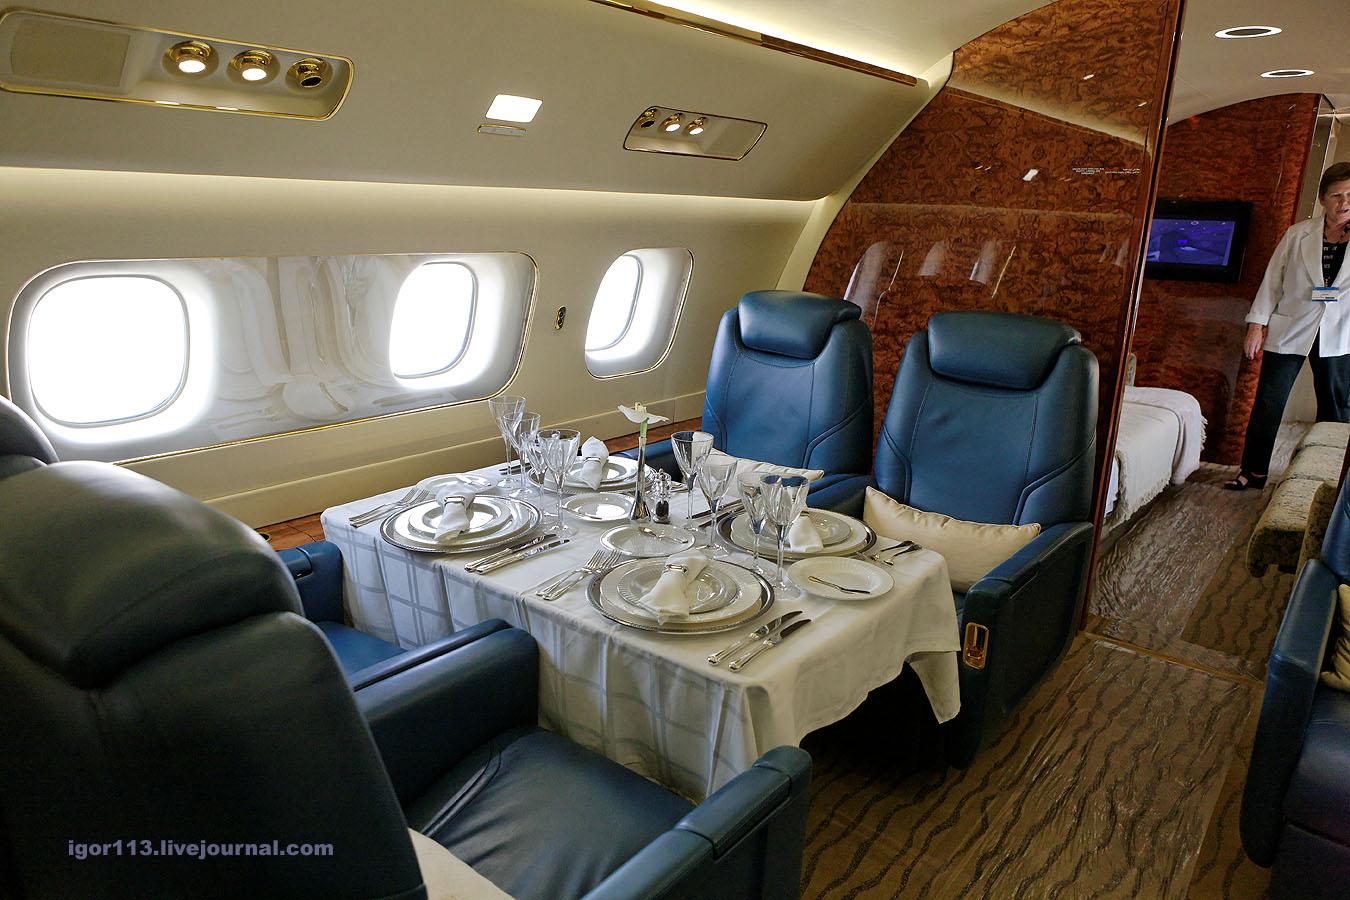 Салон самолета бизнес класса фото